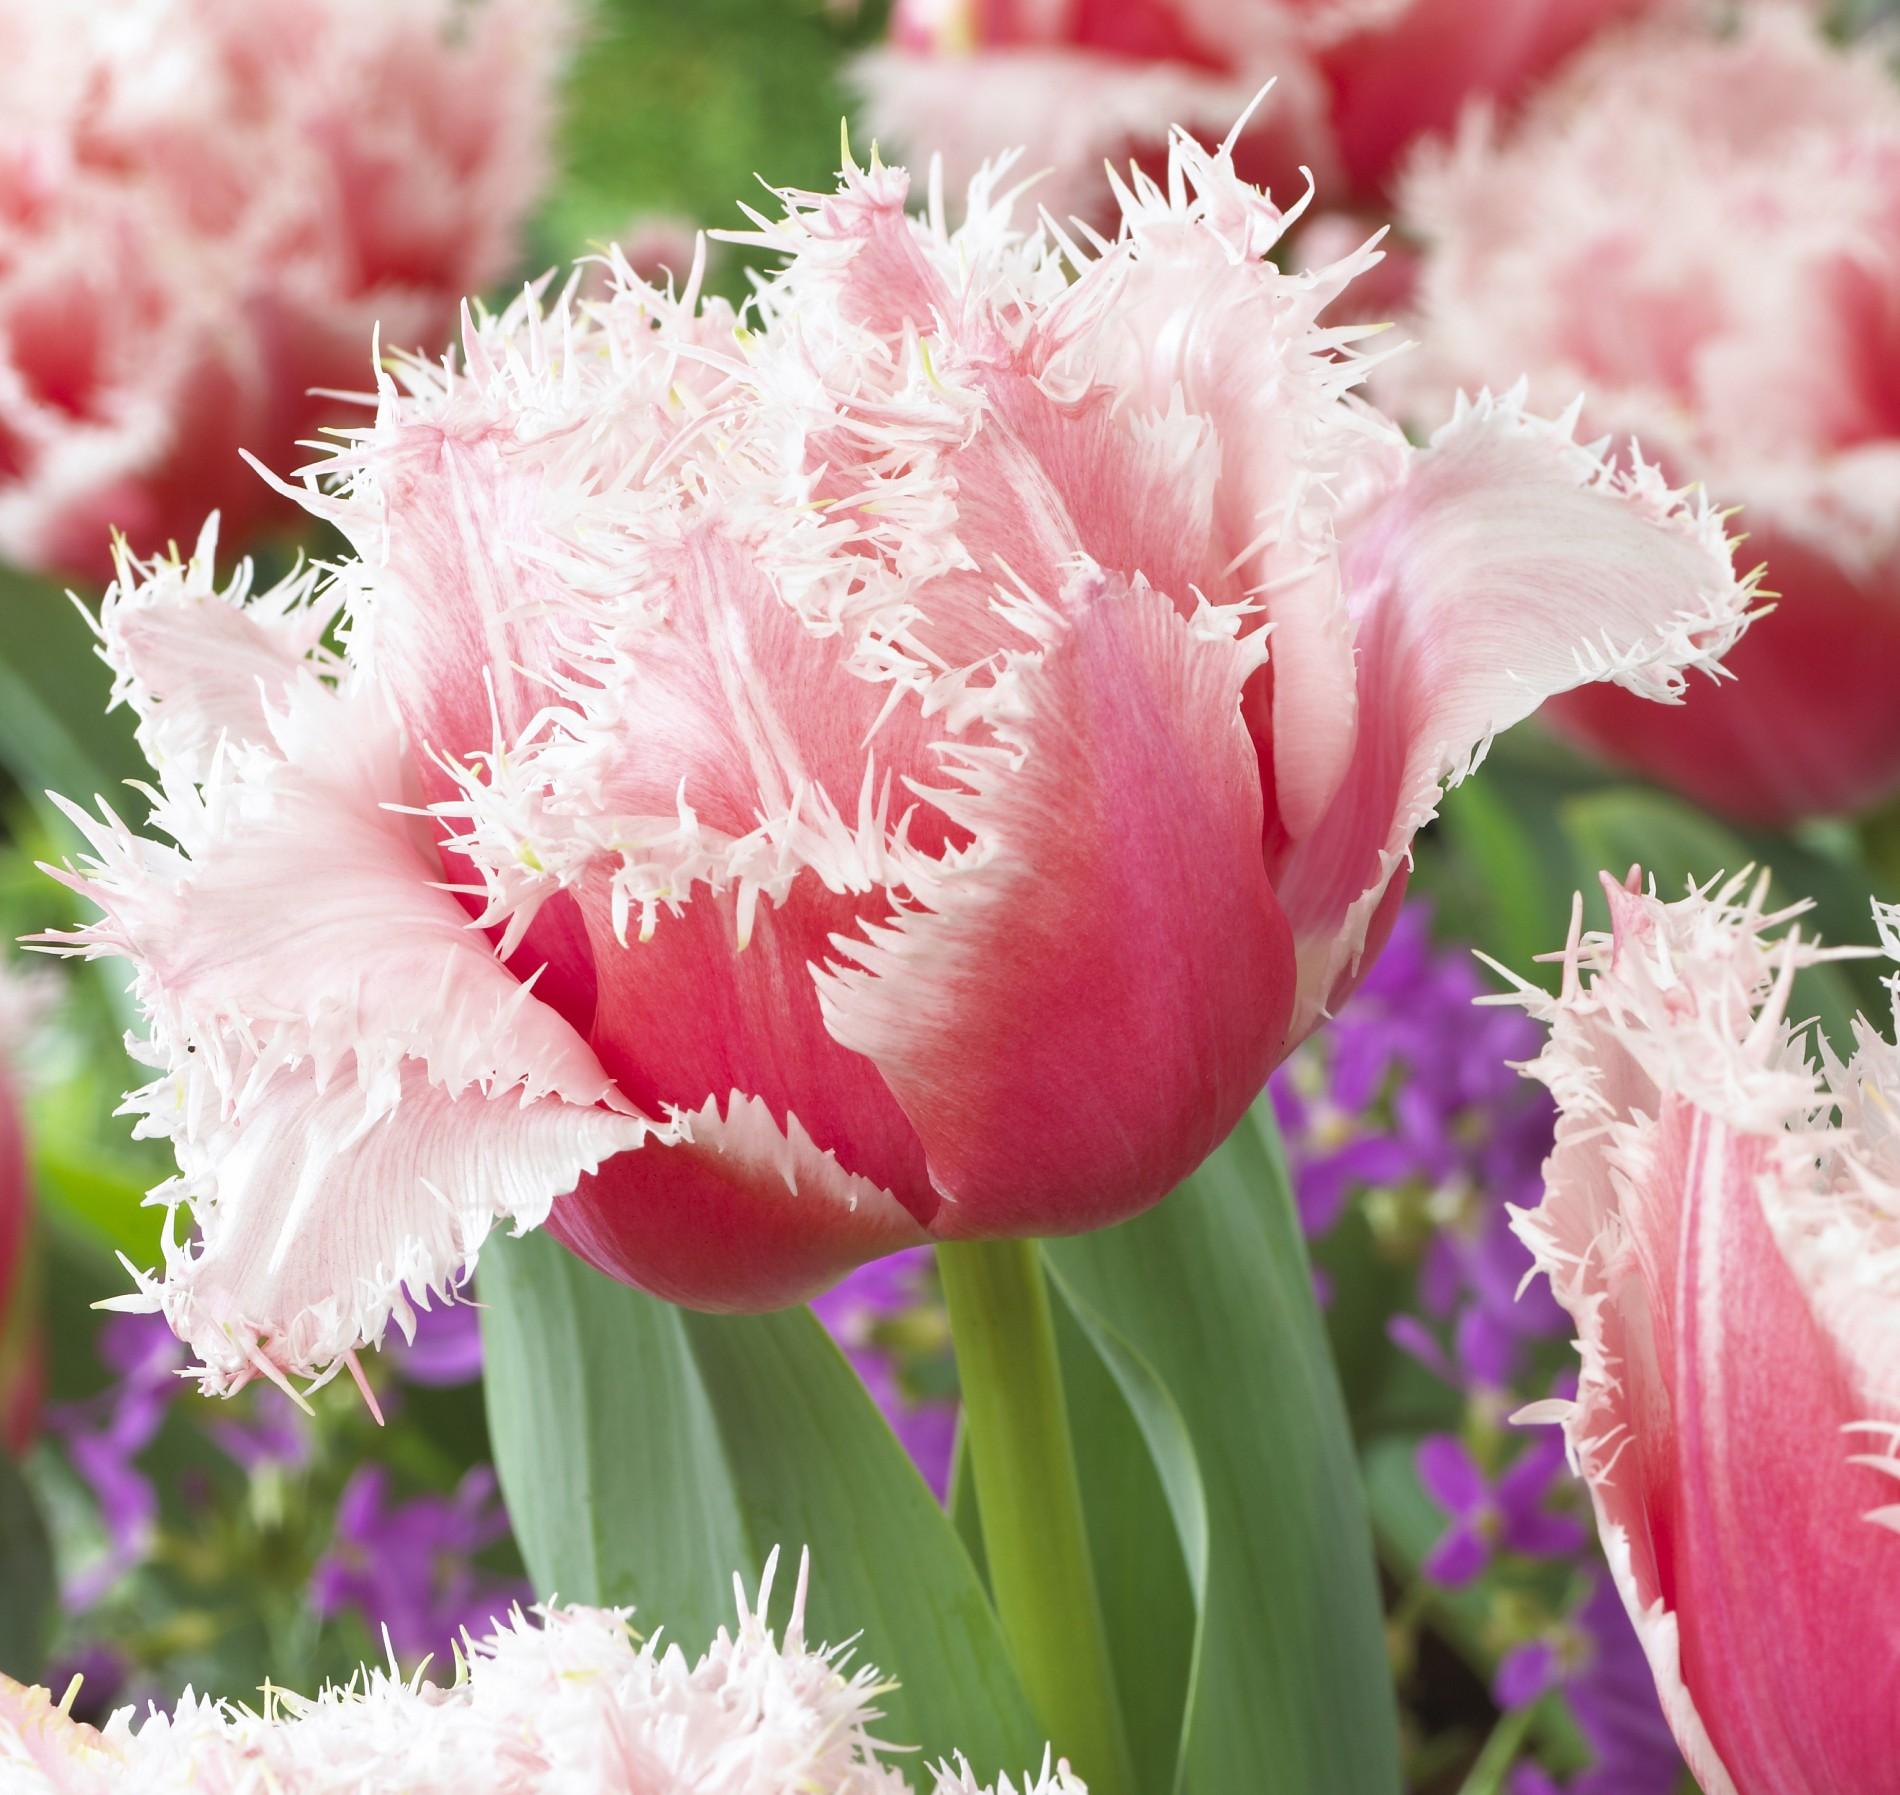 Tulipa-Queensland_visi43523-e1398273700411-1900x1795.jpg